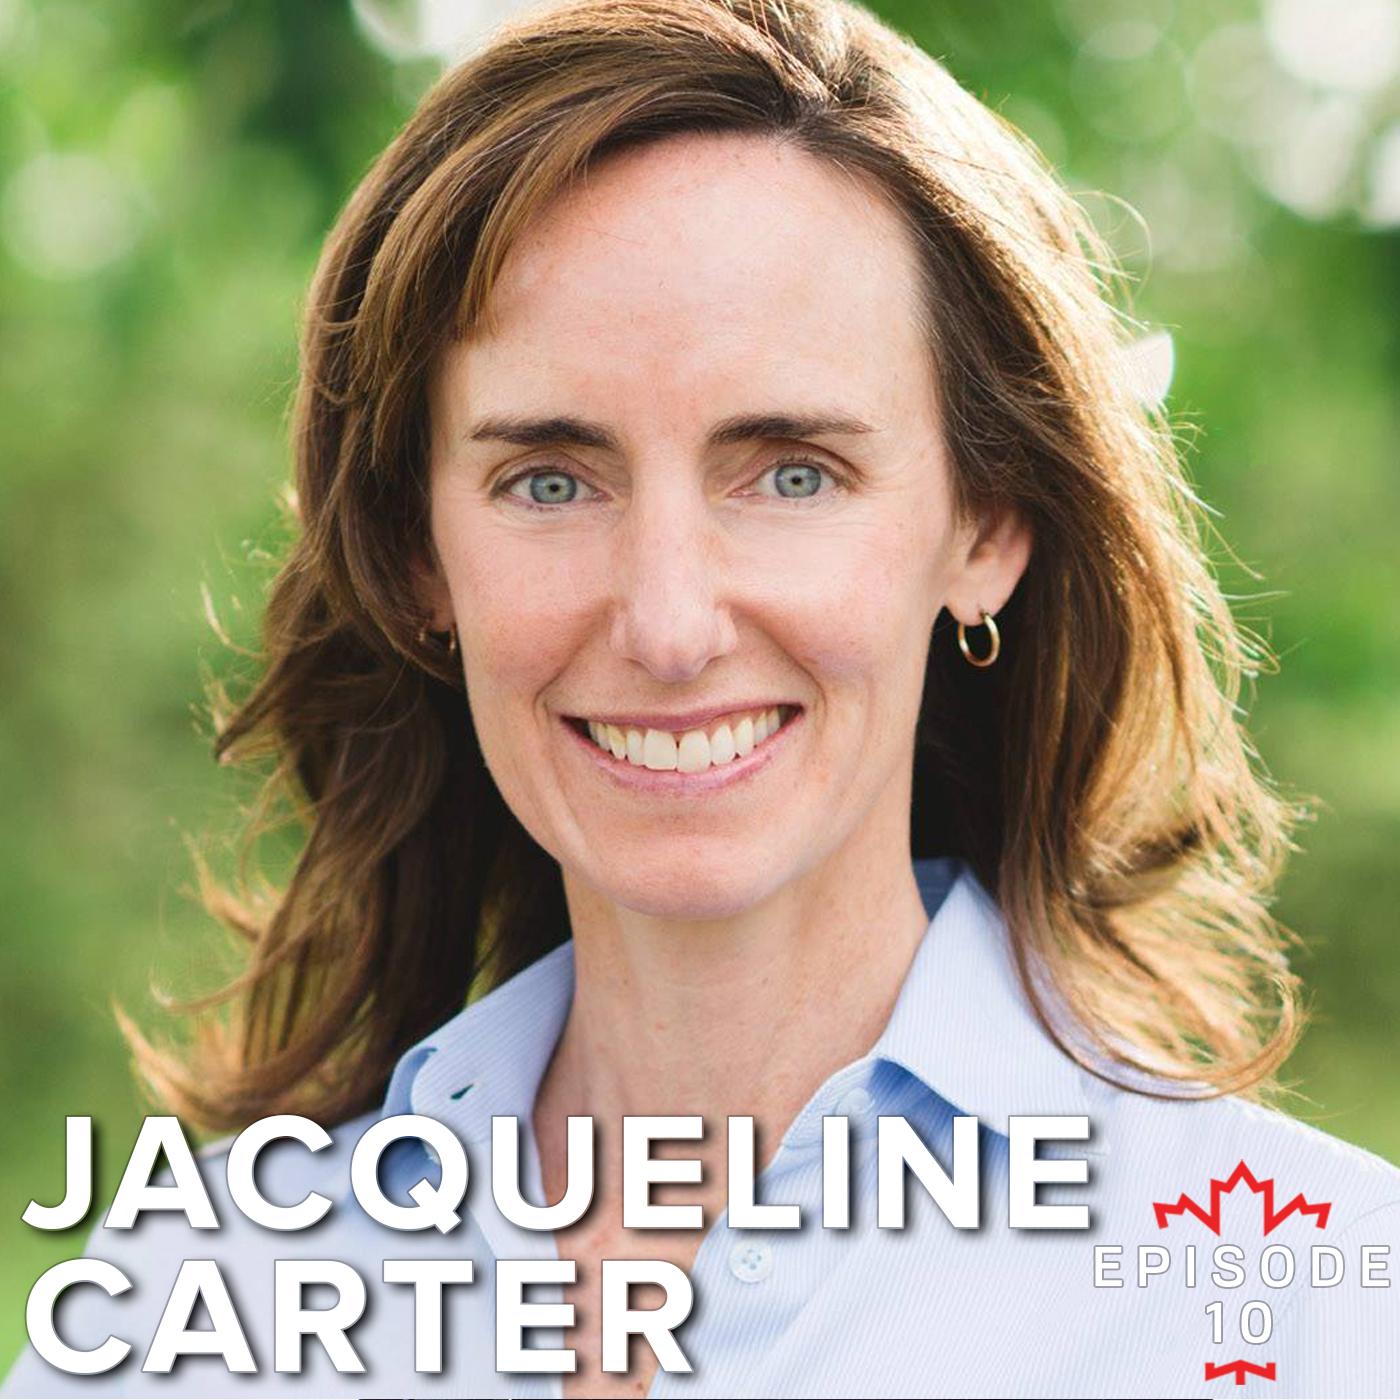 Jacqueline720.jpg